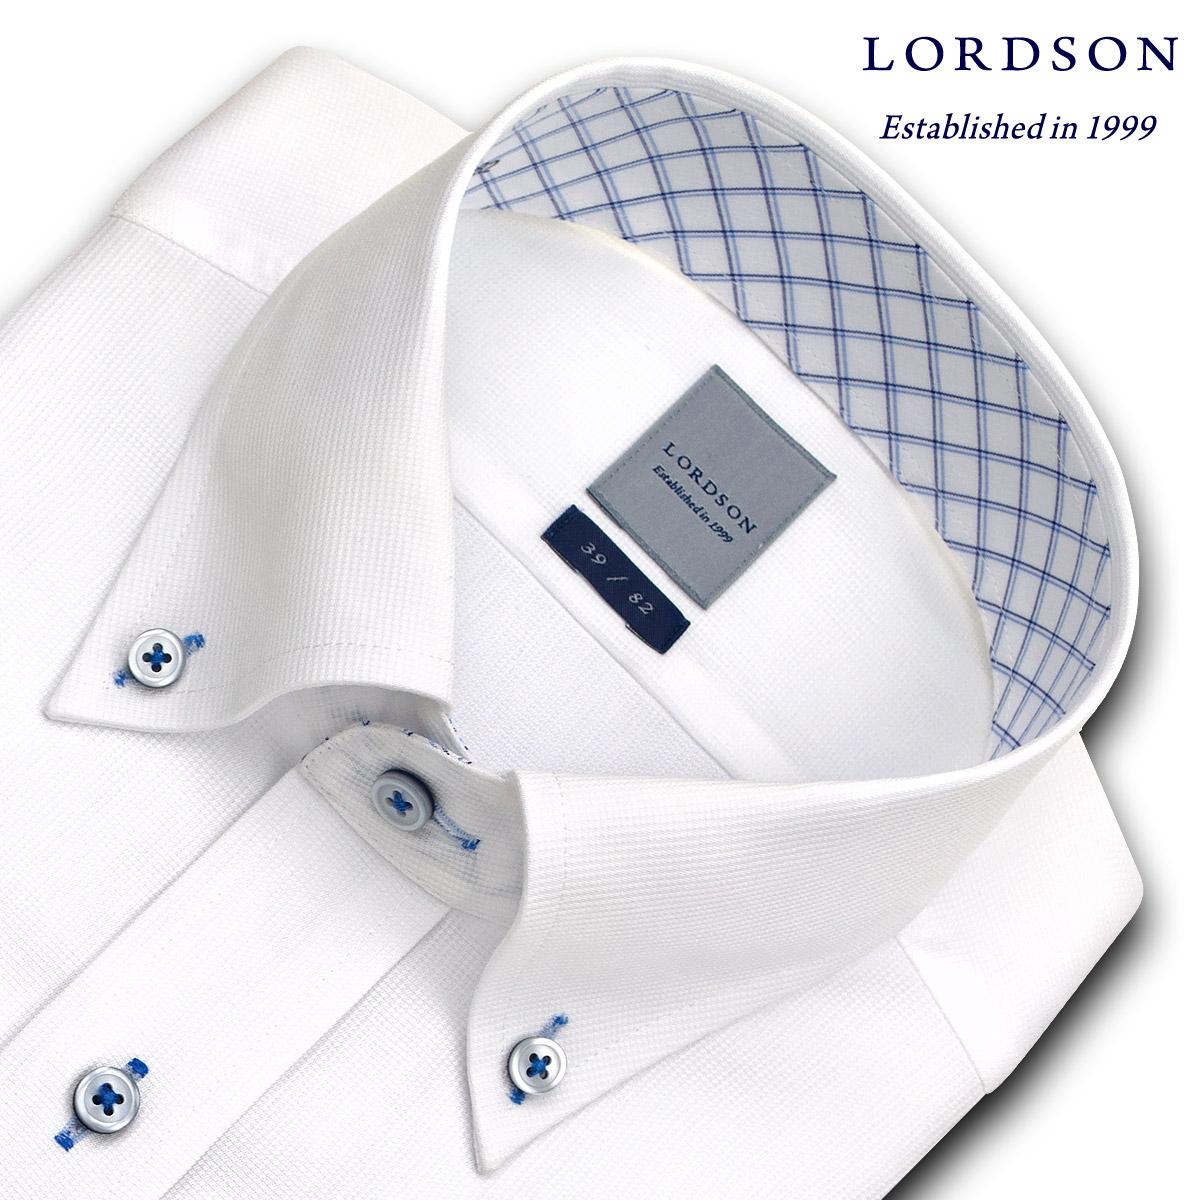 LORDSON 長袖 ワイシャツ メンズ 春夏秋 形態安定加工 吸水速乾 白ドビー ボタンダウンシャツ|綿:100% ホワイト(zod382-200)